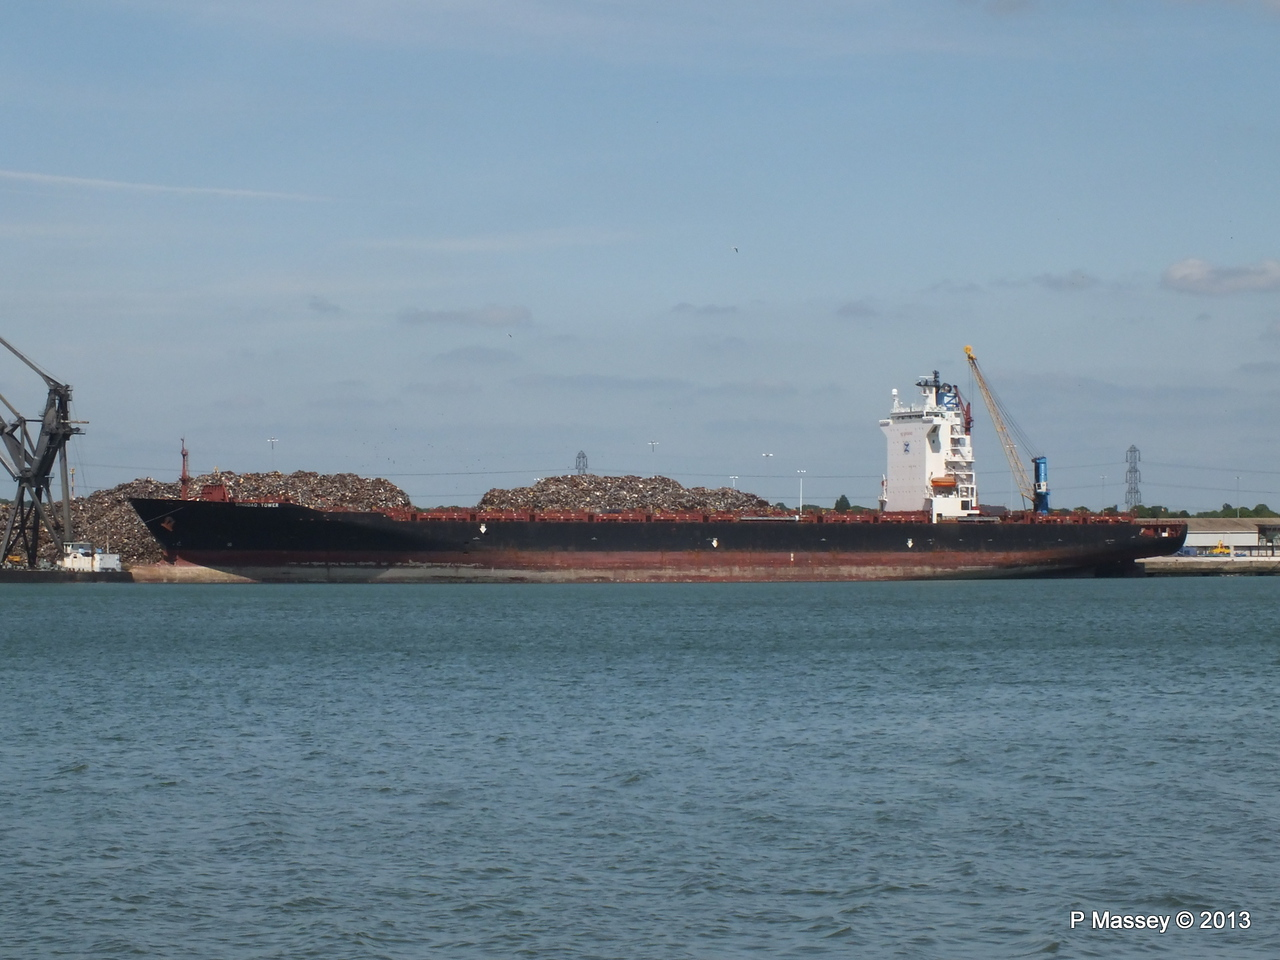 QINGDAO TOWER berth 109 Southampton PDM 01-06-2013 14-57-27